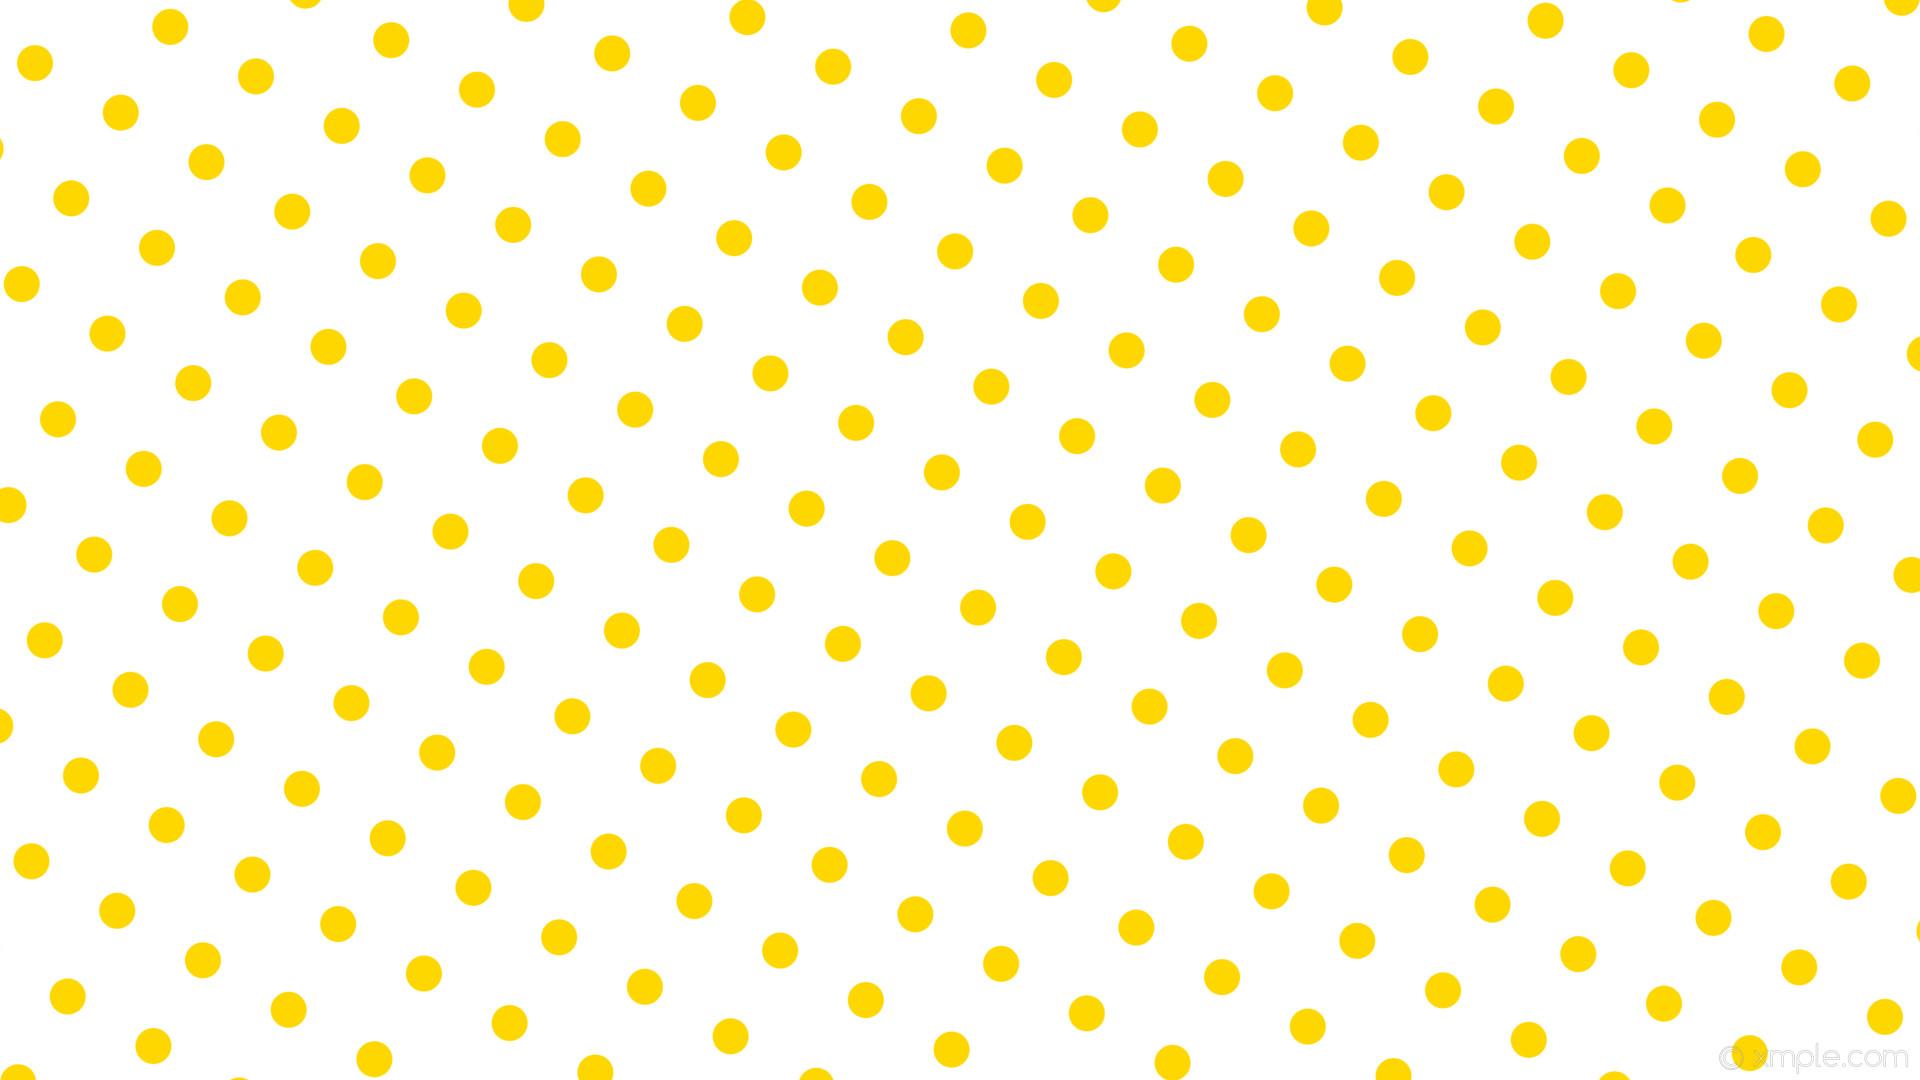 wallpaper yellow polka white spots dots gold #ffffff #ffd700 240° 36px 99px